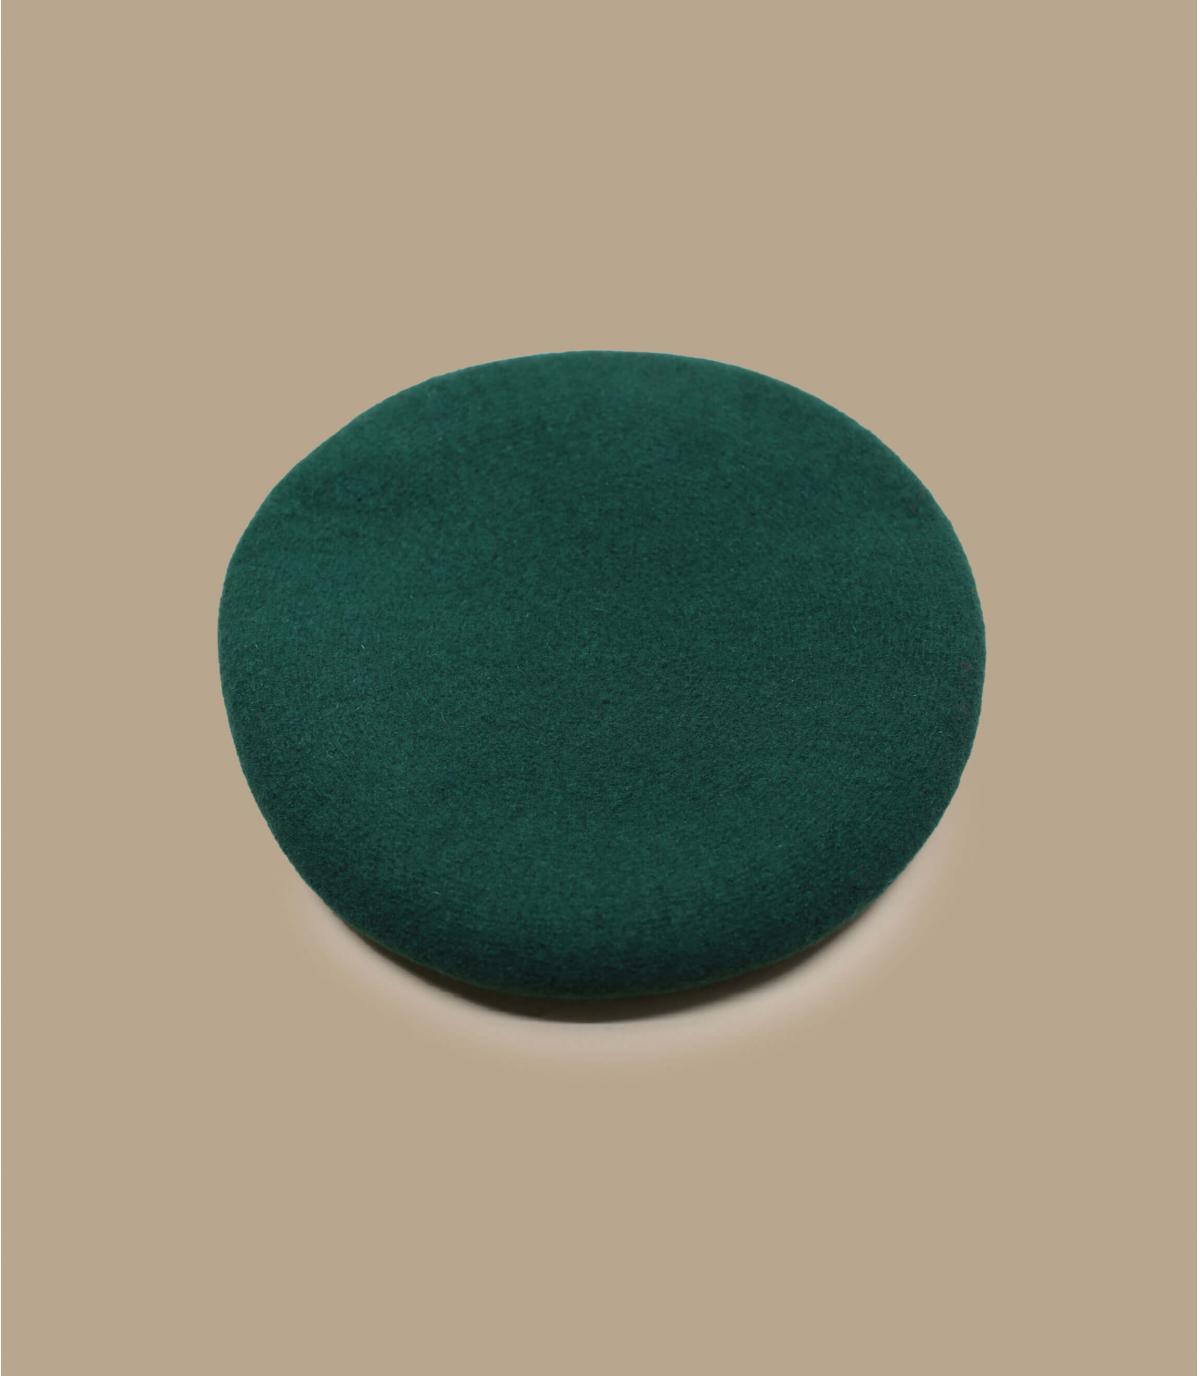 Baskenmütze commando Légion grün